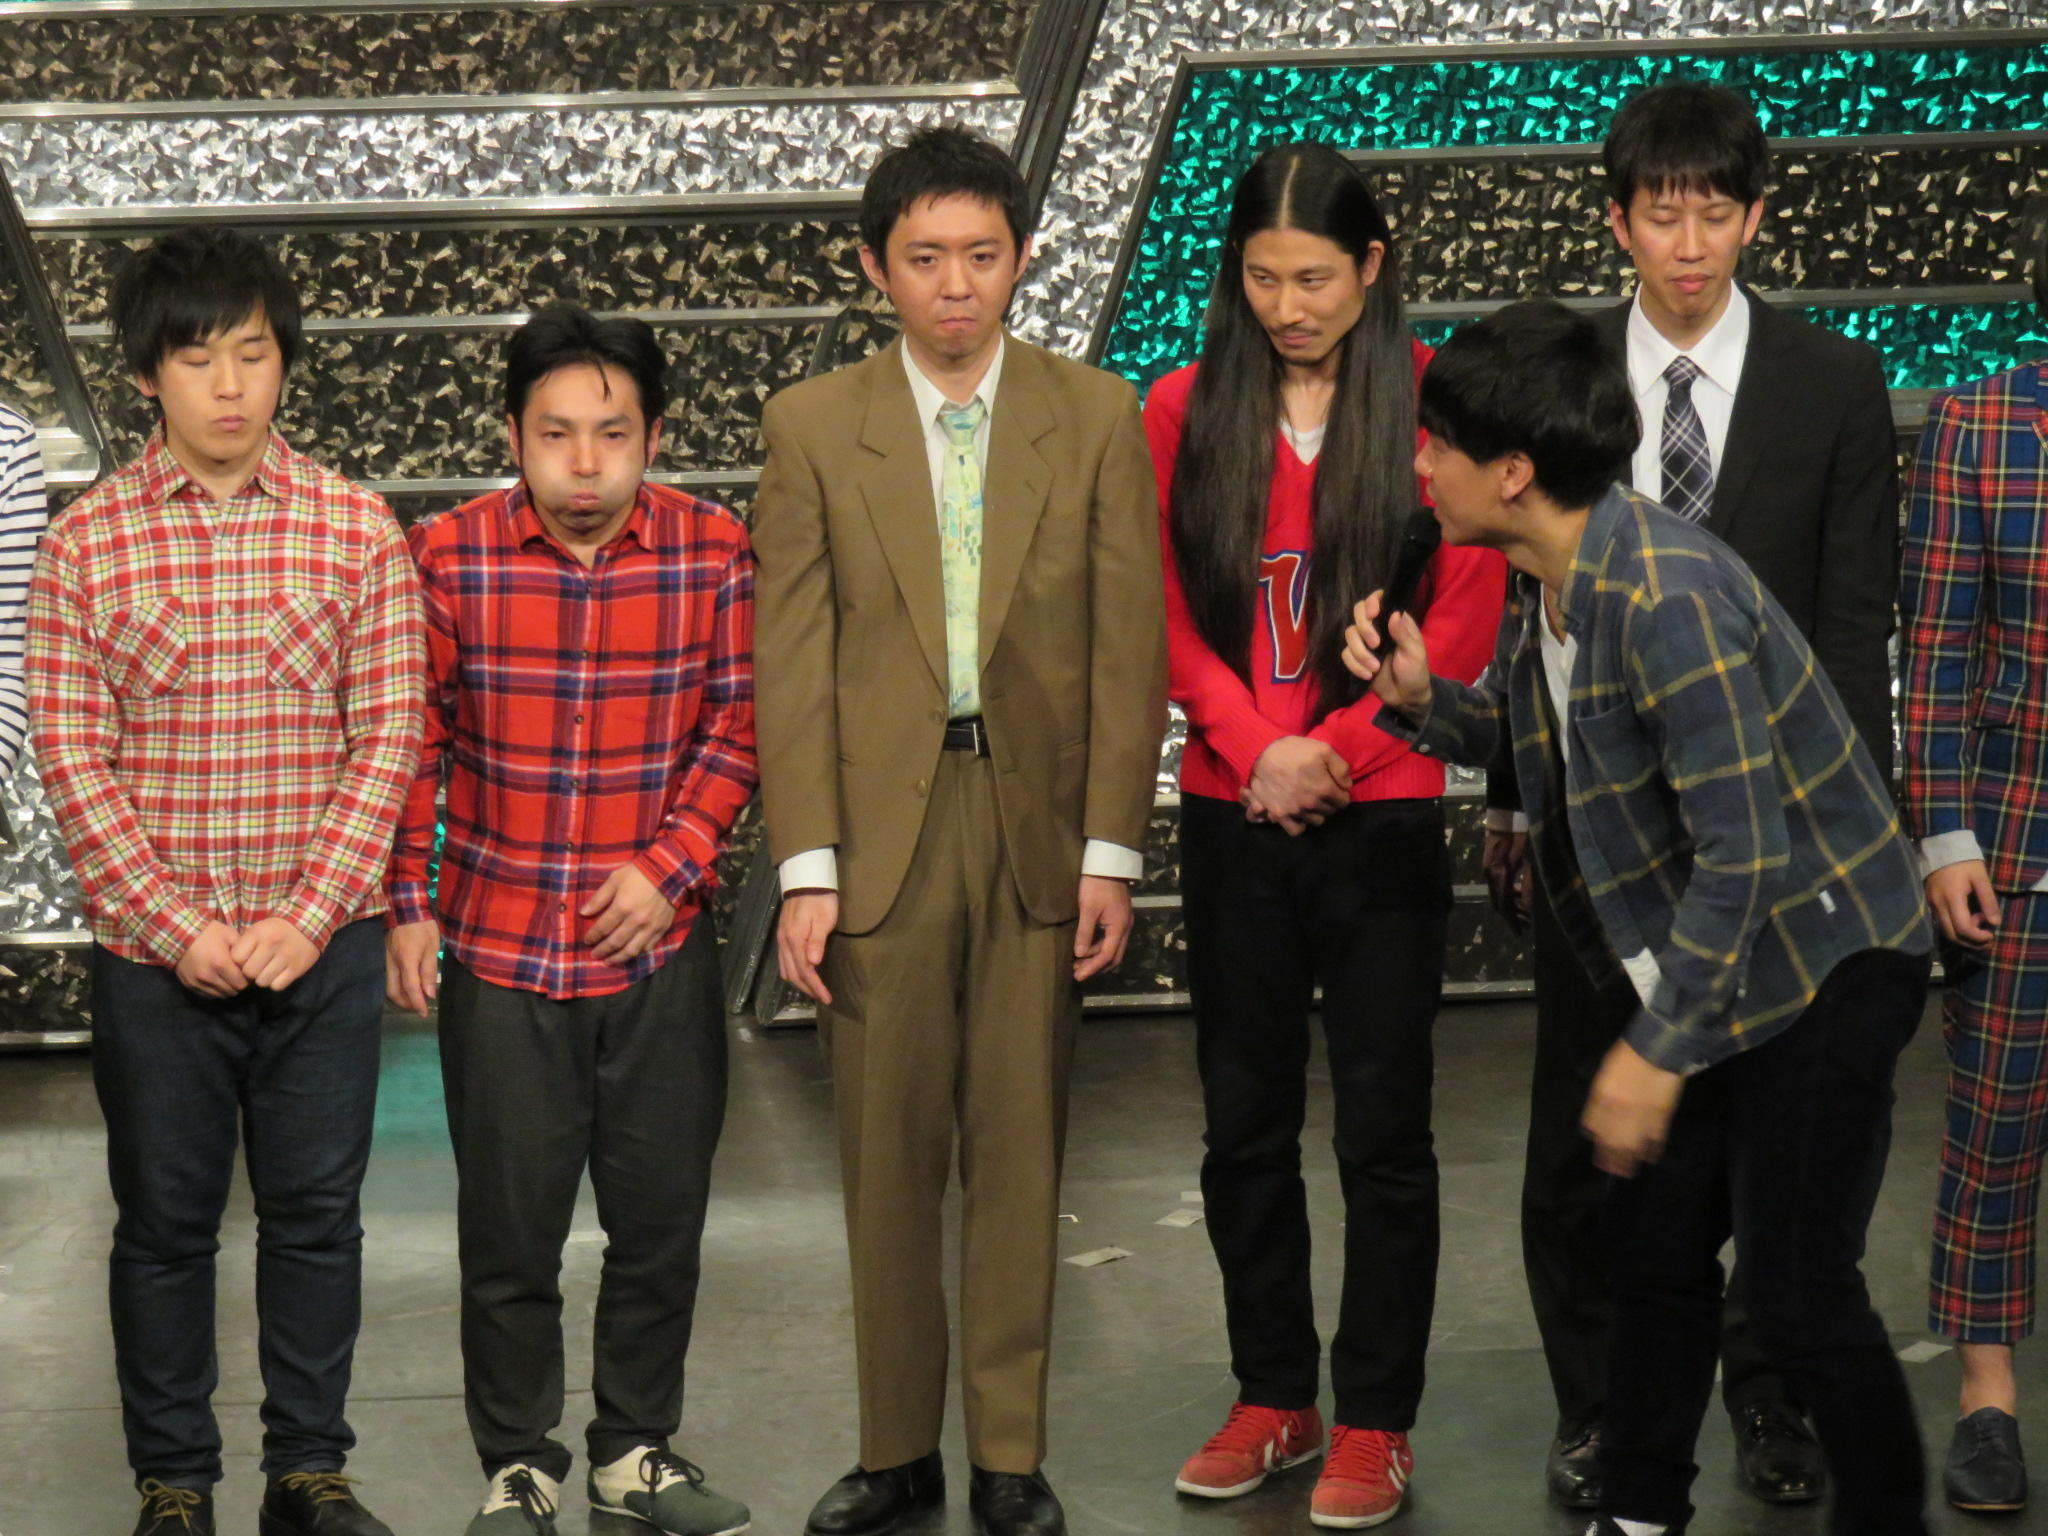 http://news.yoshimoto.co.jp/20160229163152-8f5e8453a56753bfb334603bab53f31a73278c29.jpg